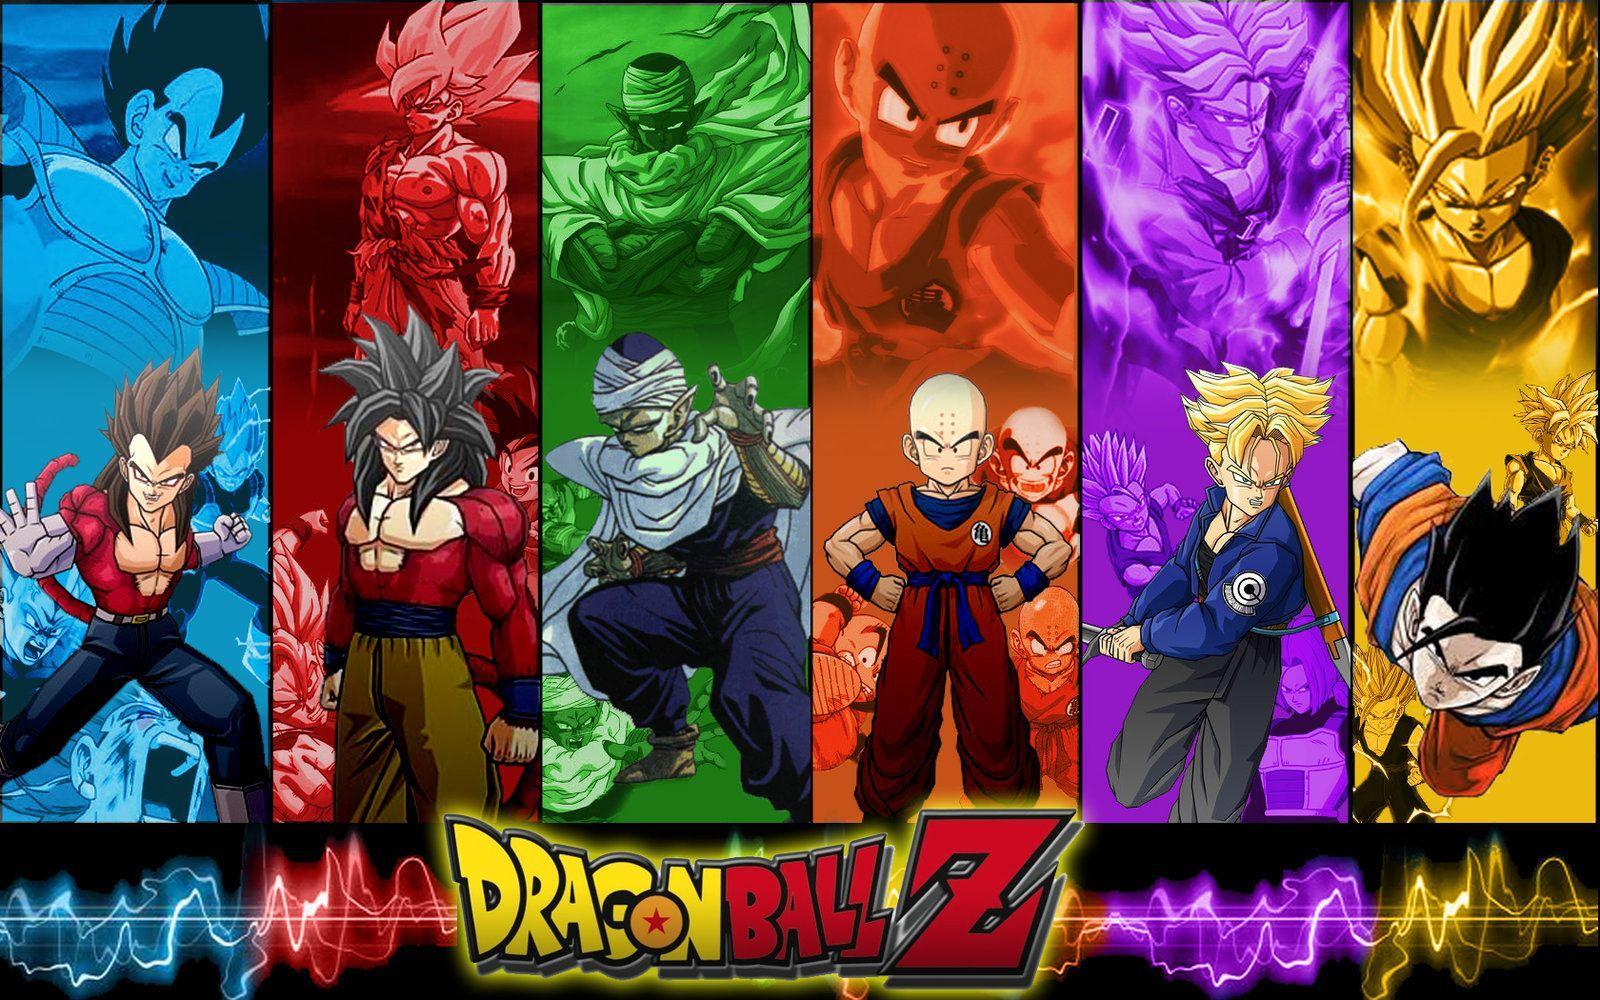 Hd Dragon Ball Z Wallpapers Wallpaper Cave